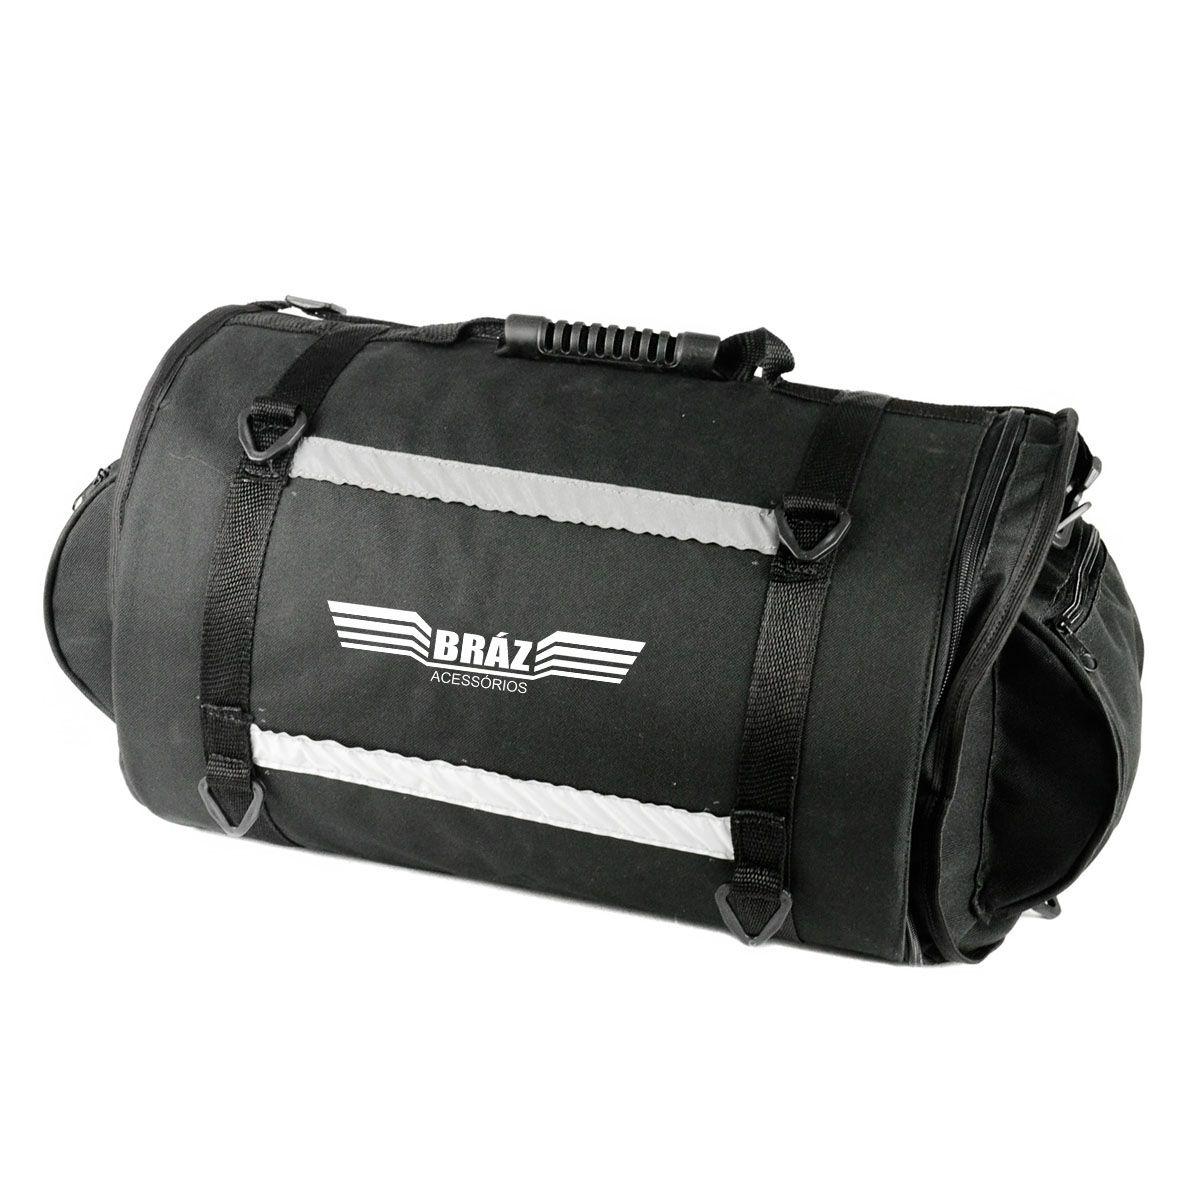 Alforge Traseiro Roll Bag para Moto Big Trail 26 Litros Bráz  - Motorshopp